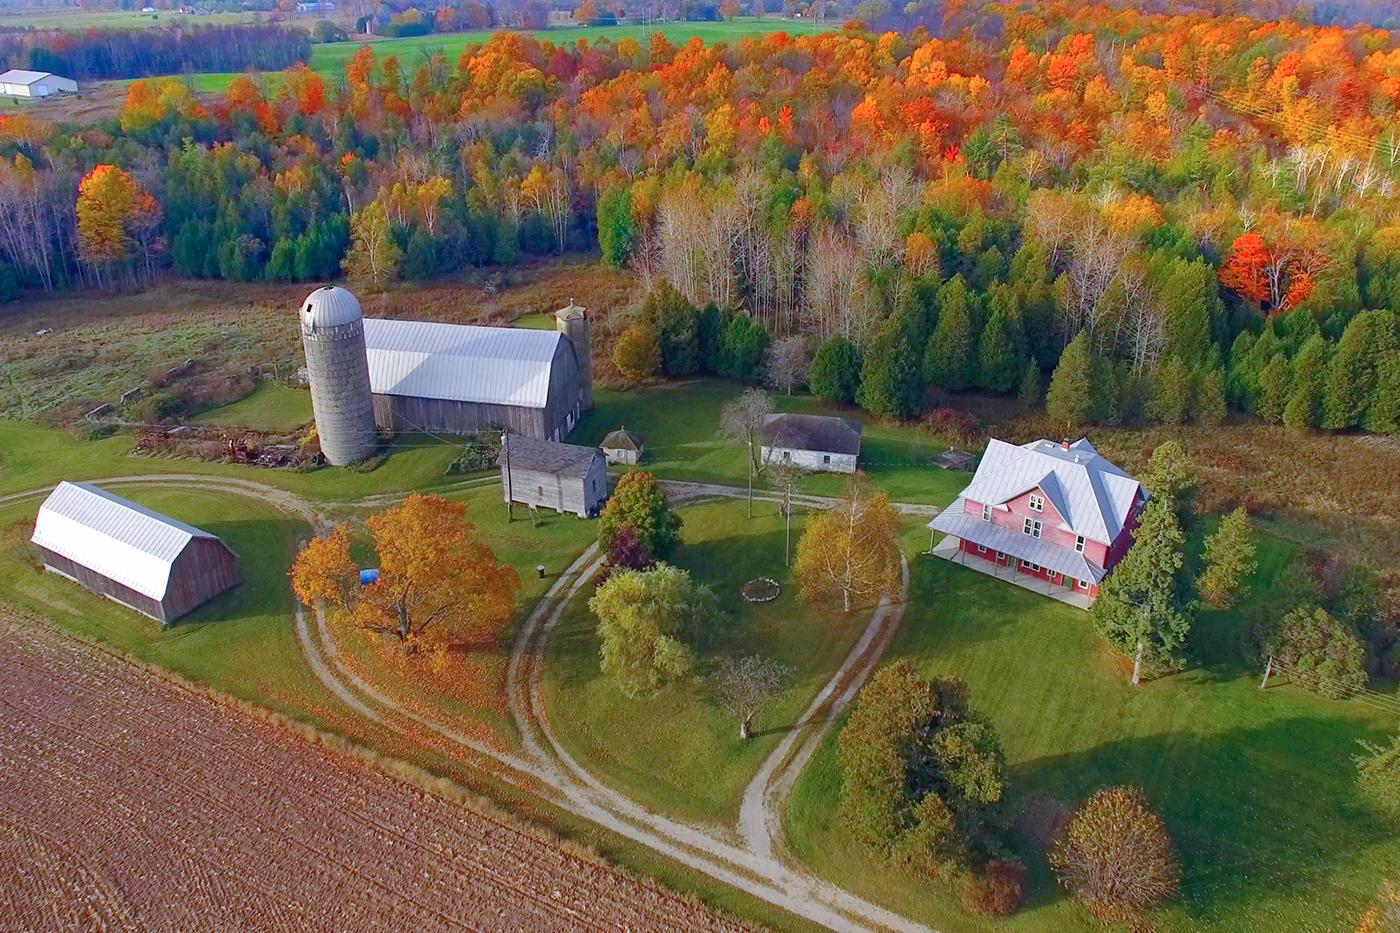 house in rural fall setting